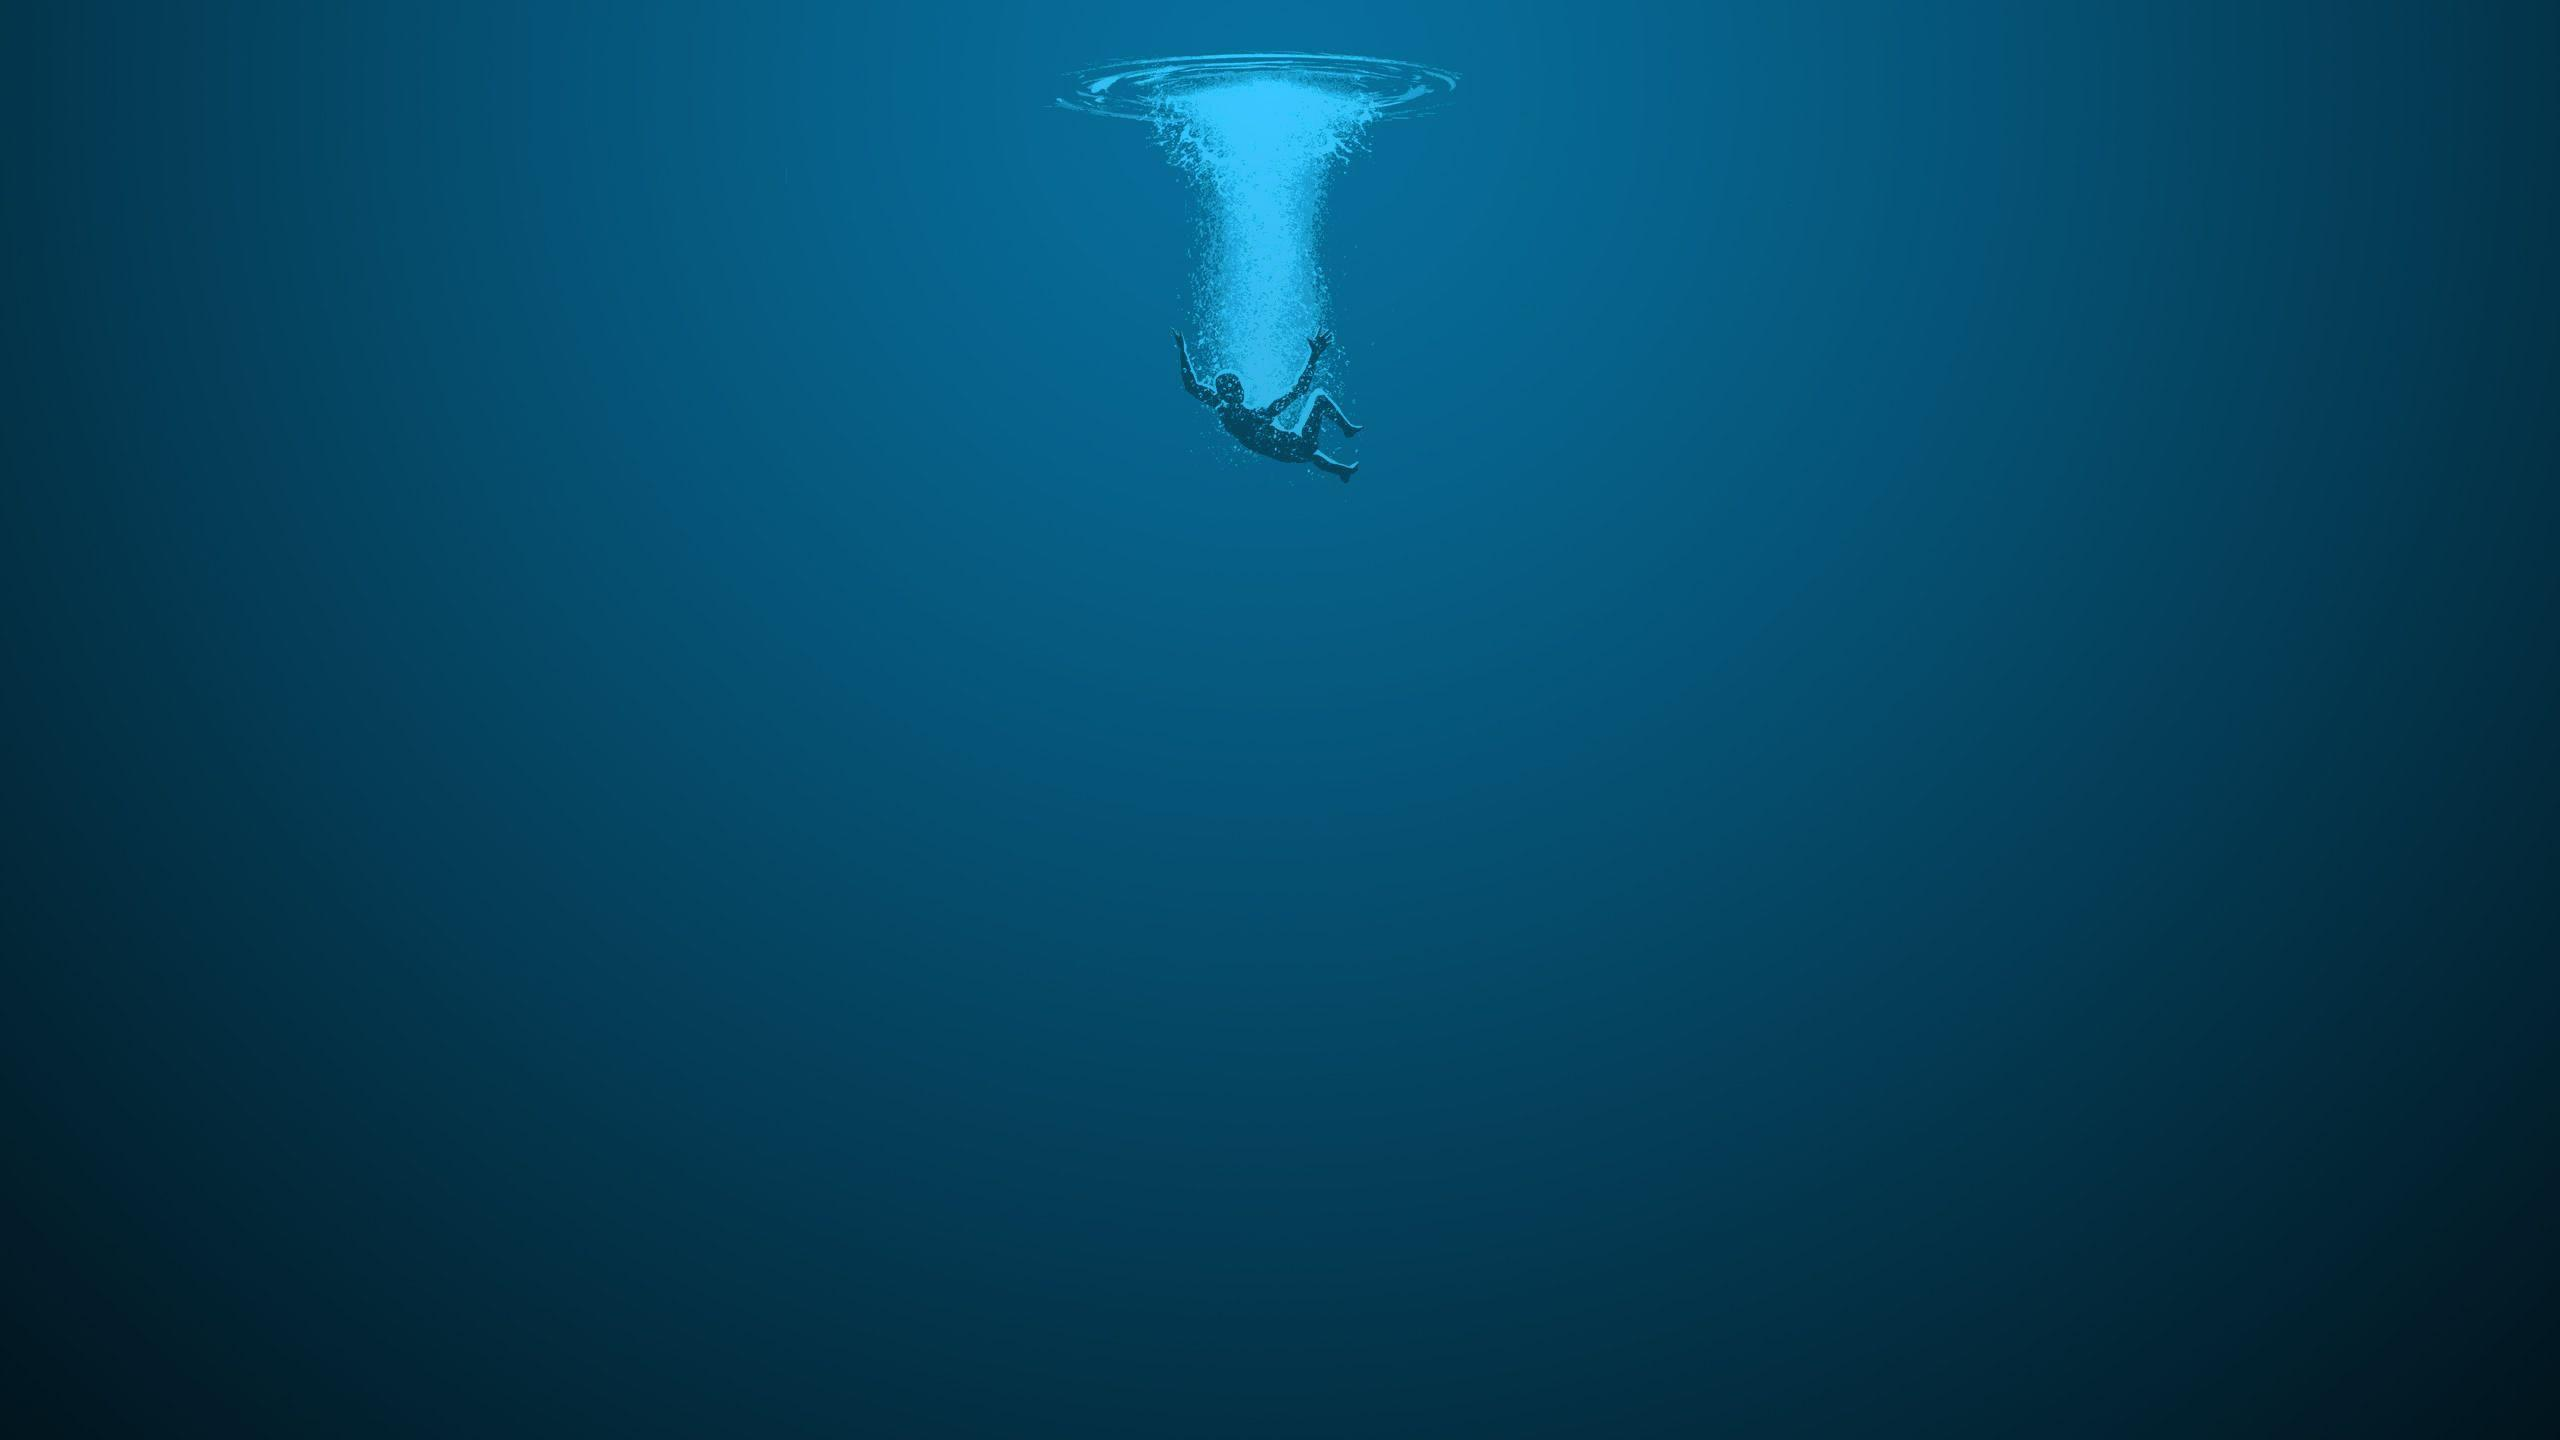 Deep Sea Wallpapers 2560x1440